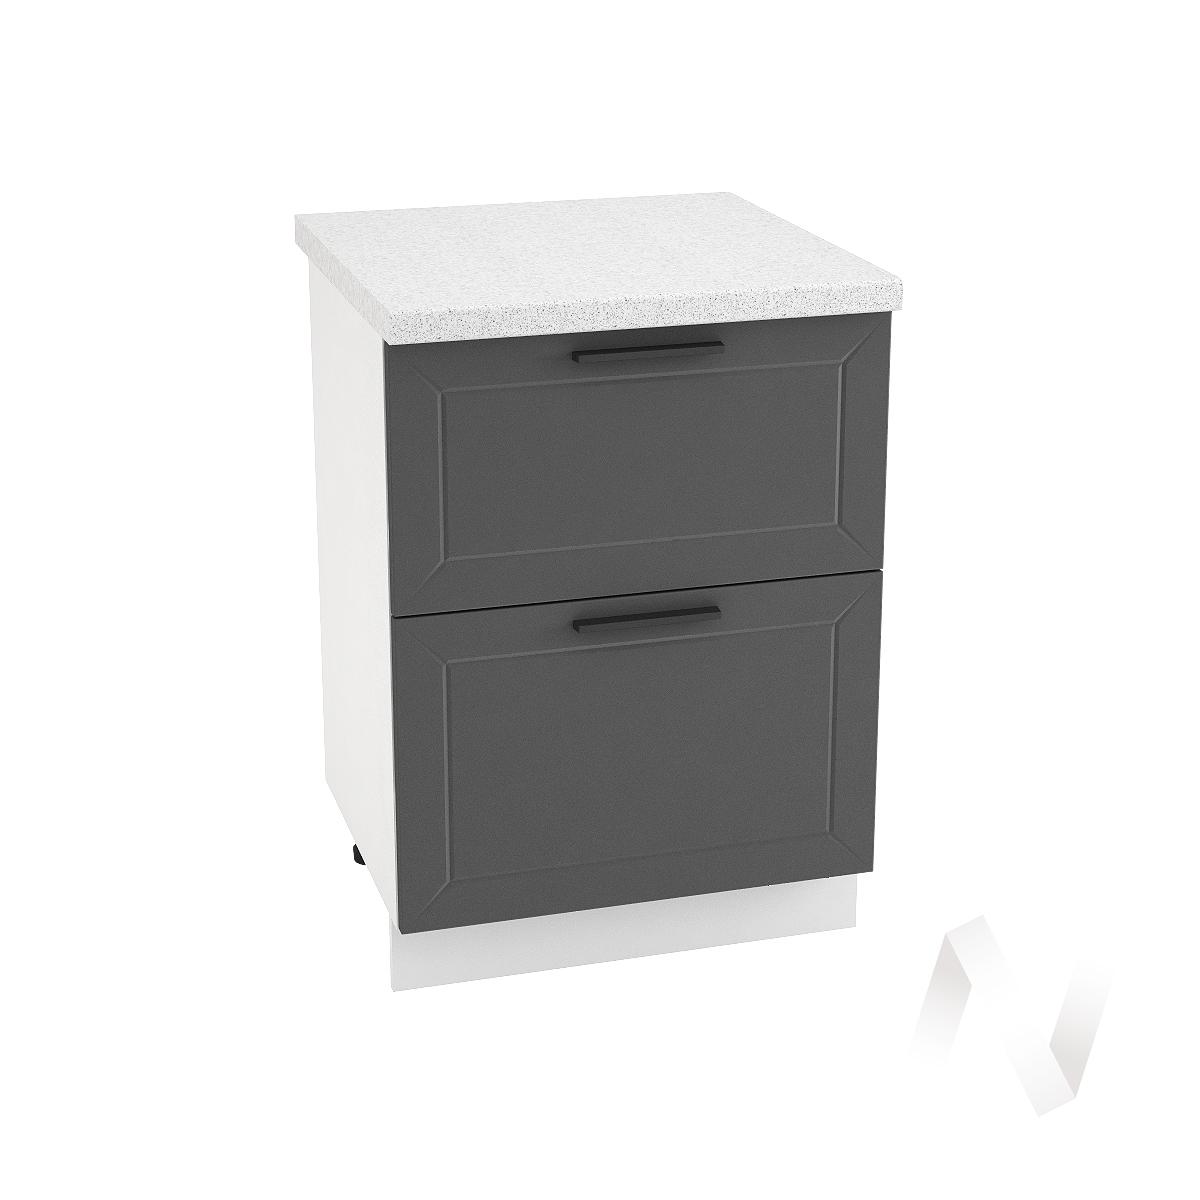 "Кухня ""Глетчер"": Шкаф нижний с 2-мя ящиками 600, ШН2Я 600 (Маренго силк/корпус белый)"